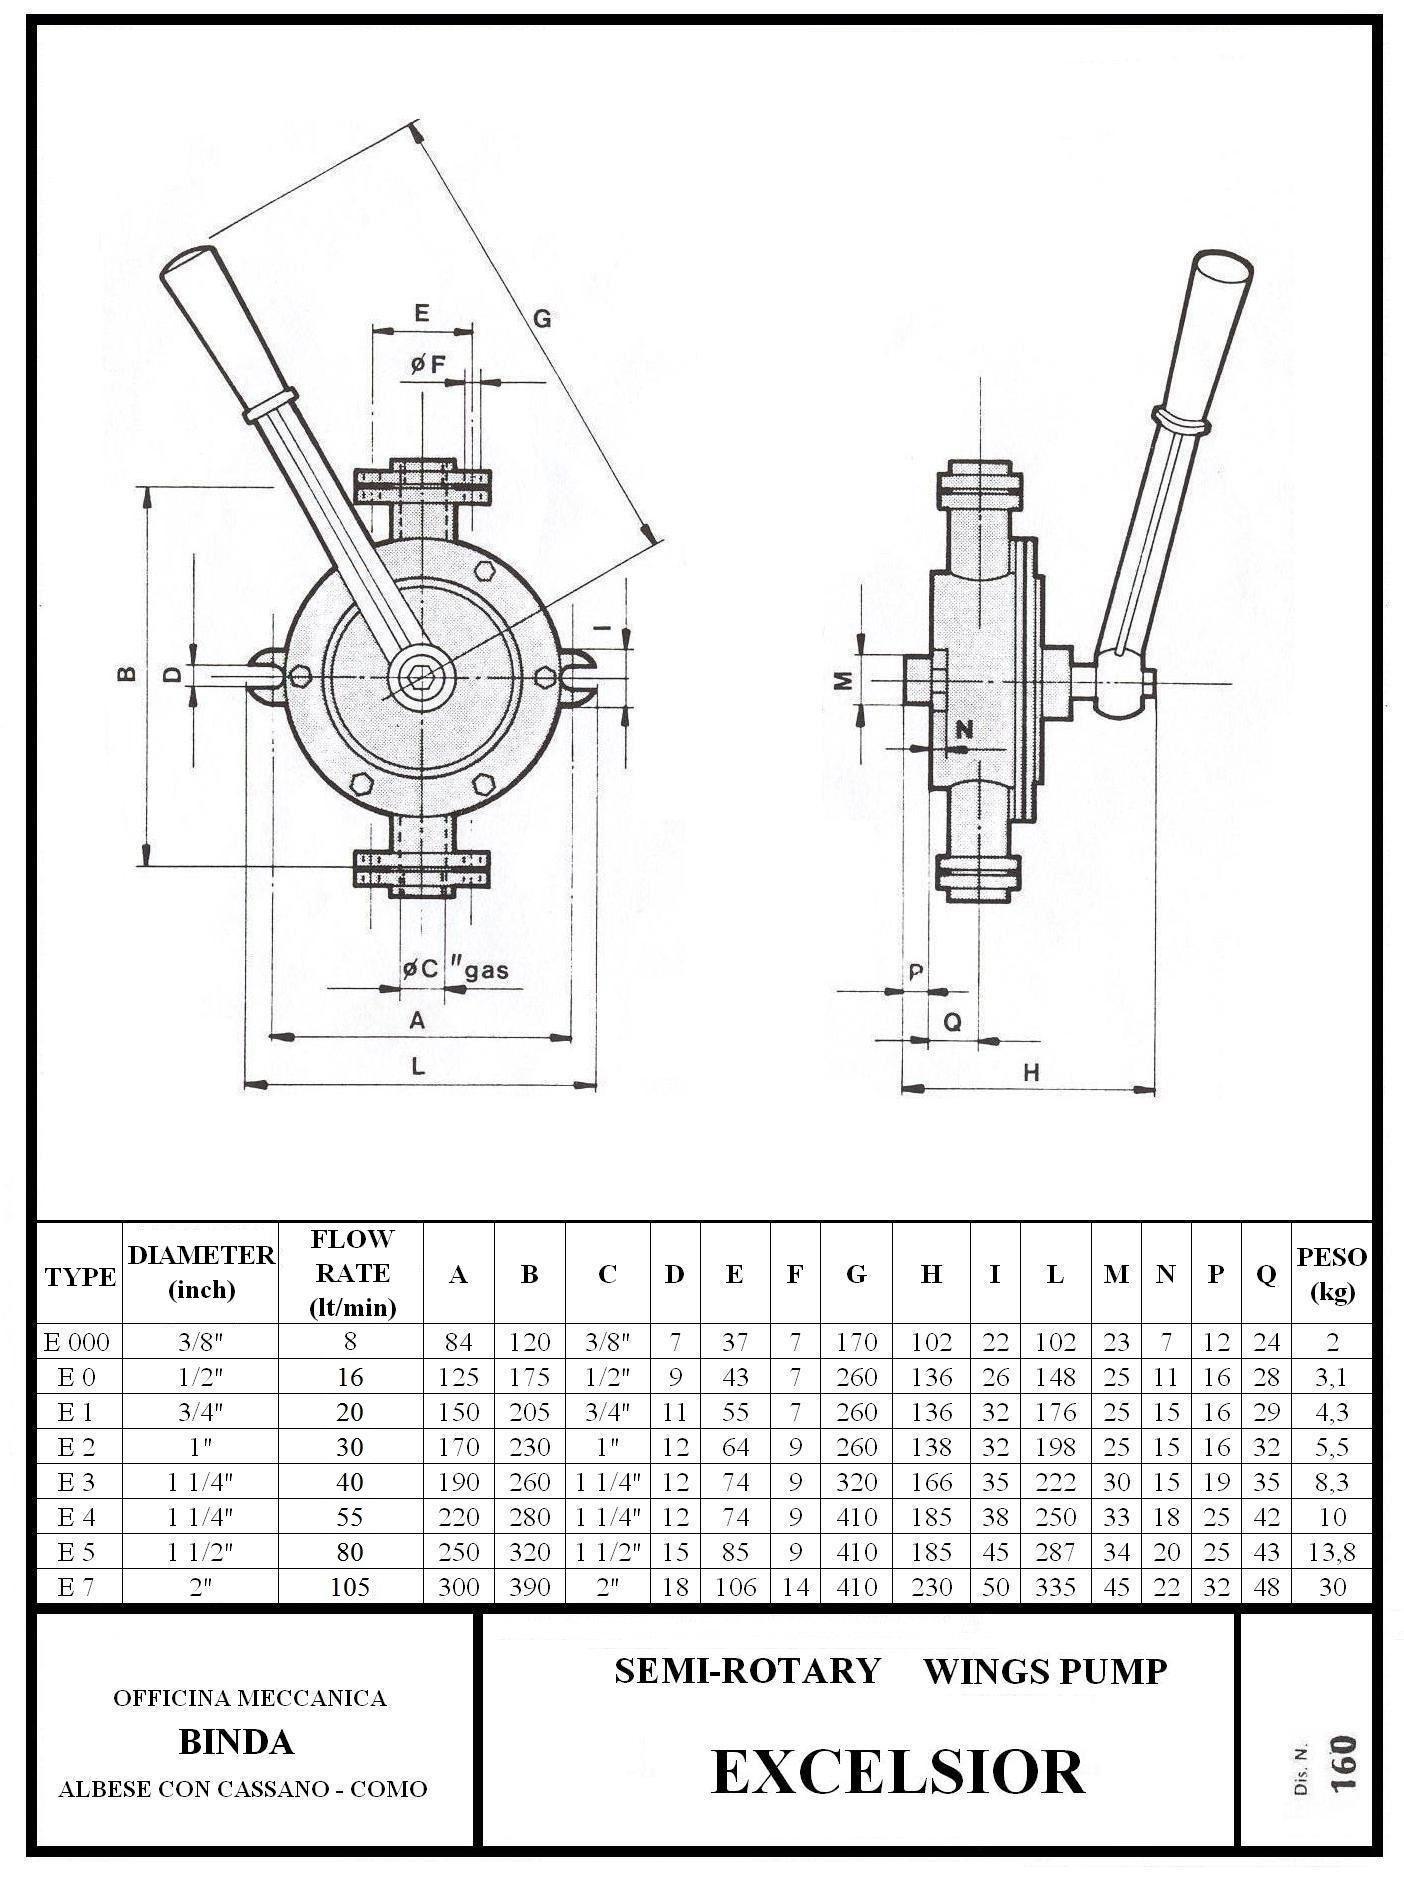 Binda Excelsior G Semi-Rotary Hand Pump & Manual Pump